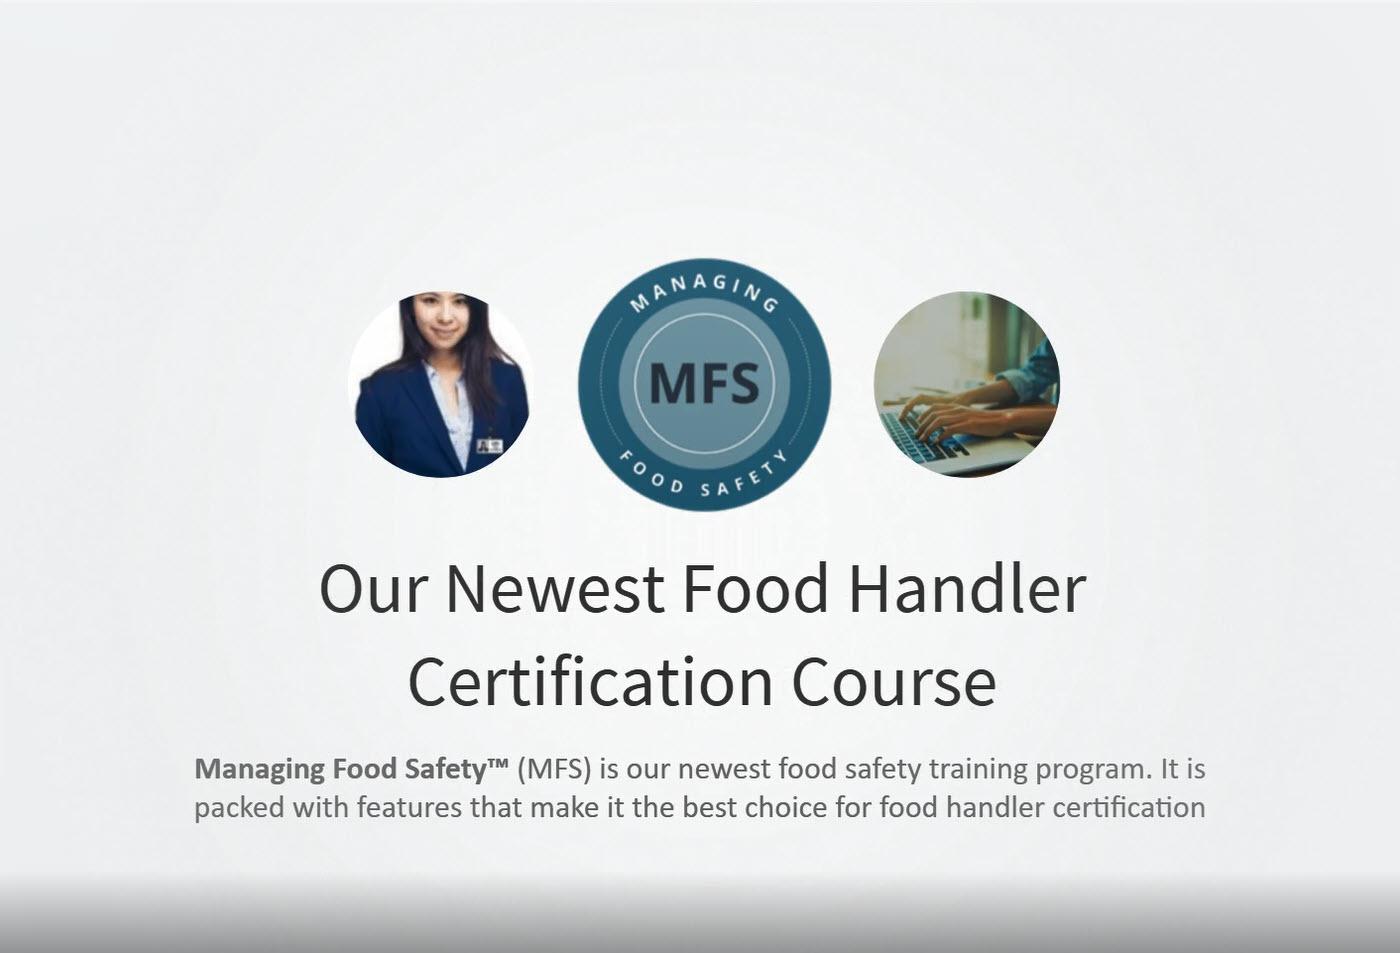 FoodSafetyMarket.com Presents